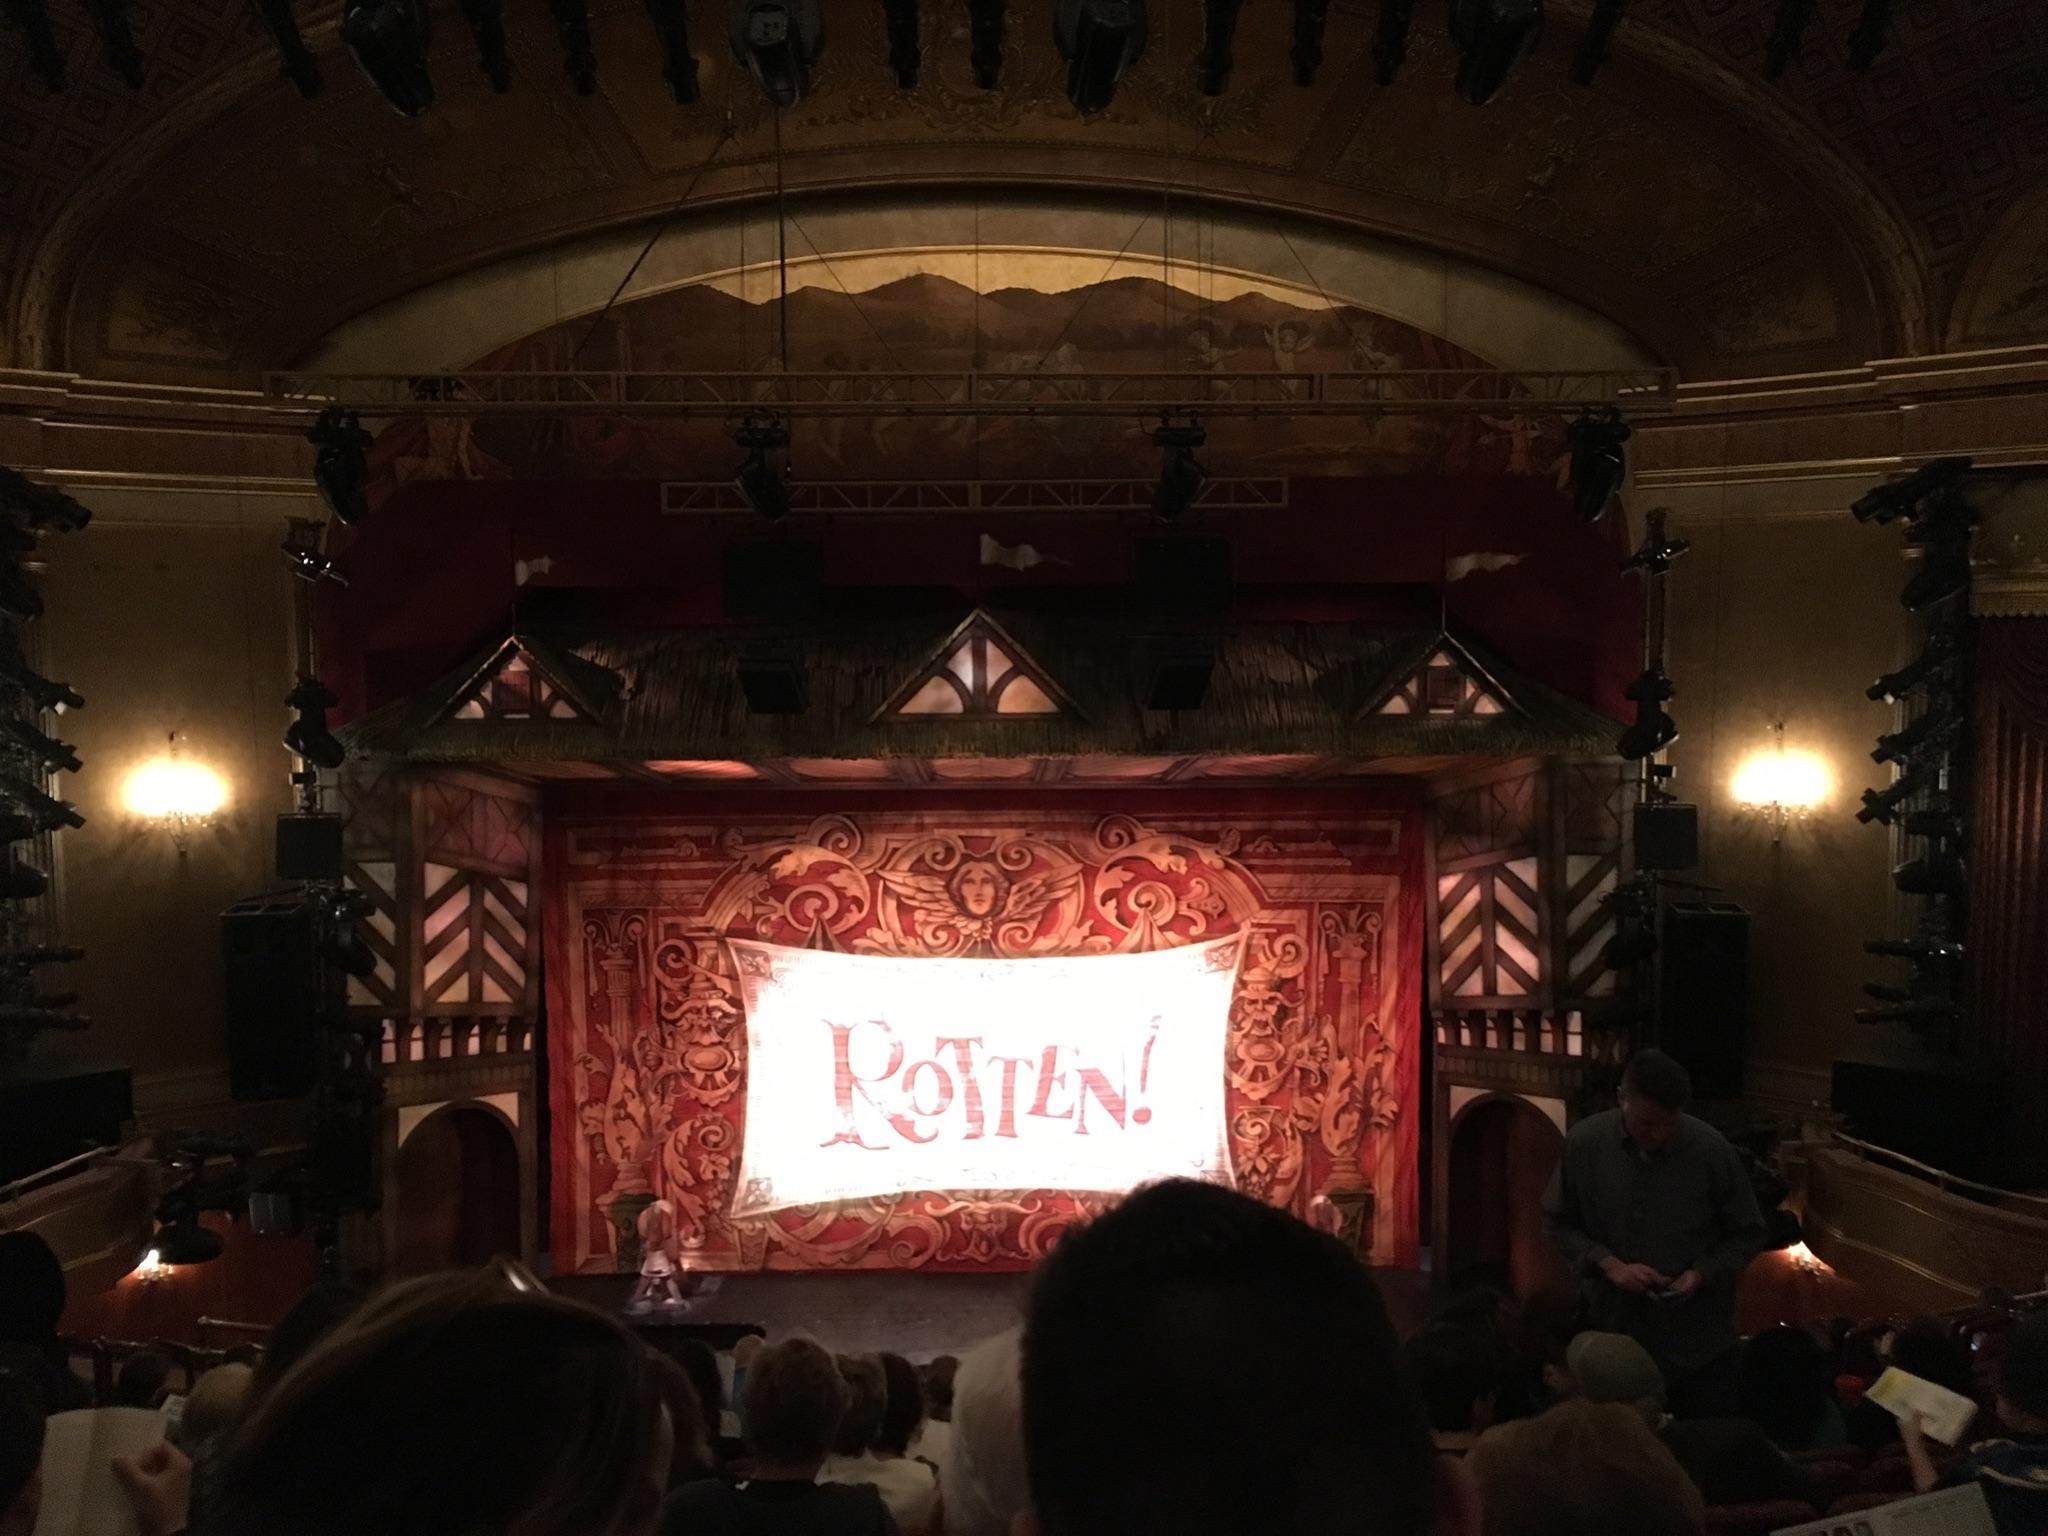 St. James Theatre Section Mezzanine C Row M Seat 107